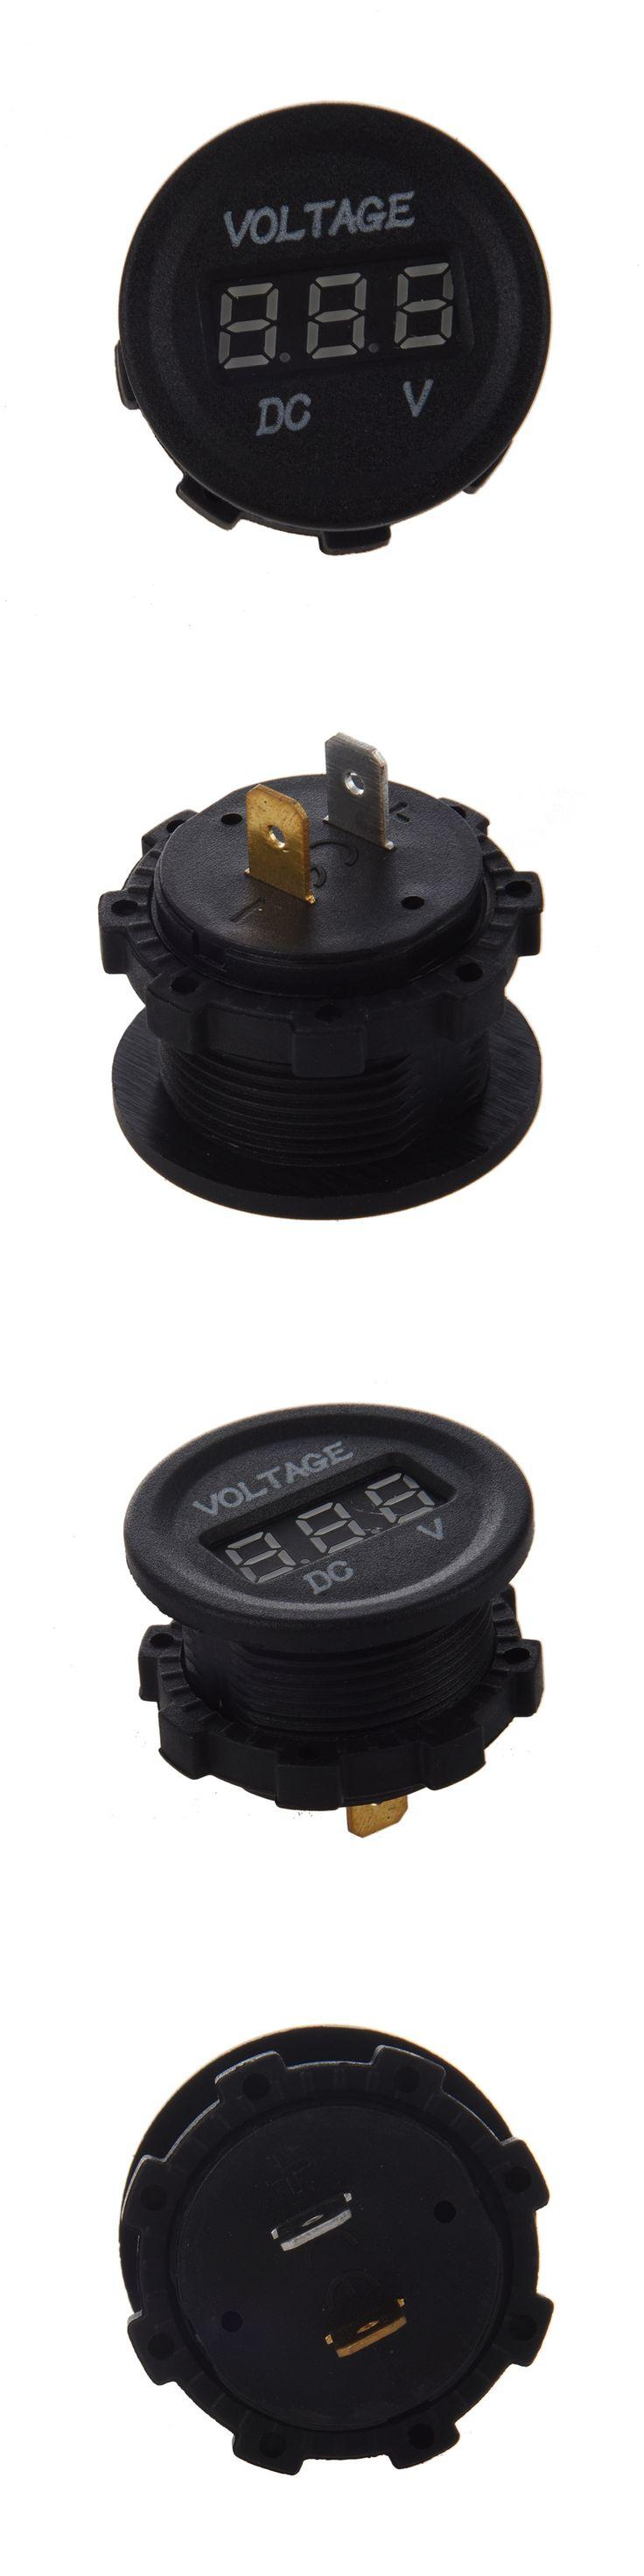 Hot Sale LED Display Car Digital Voltmeter Electric Voltage Meter Monitor Socket for Truck Automobile Motorcycle Digital Meter